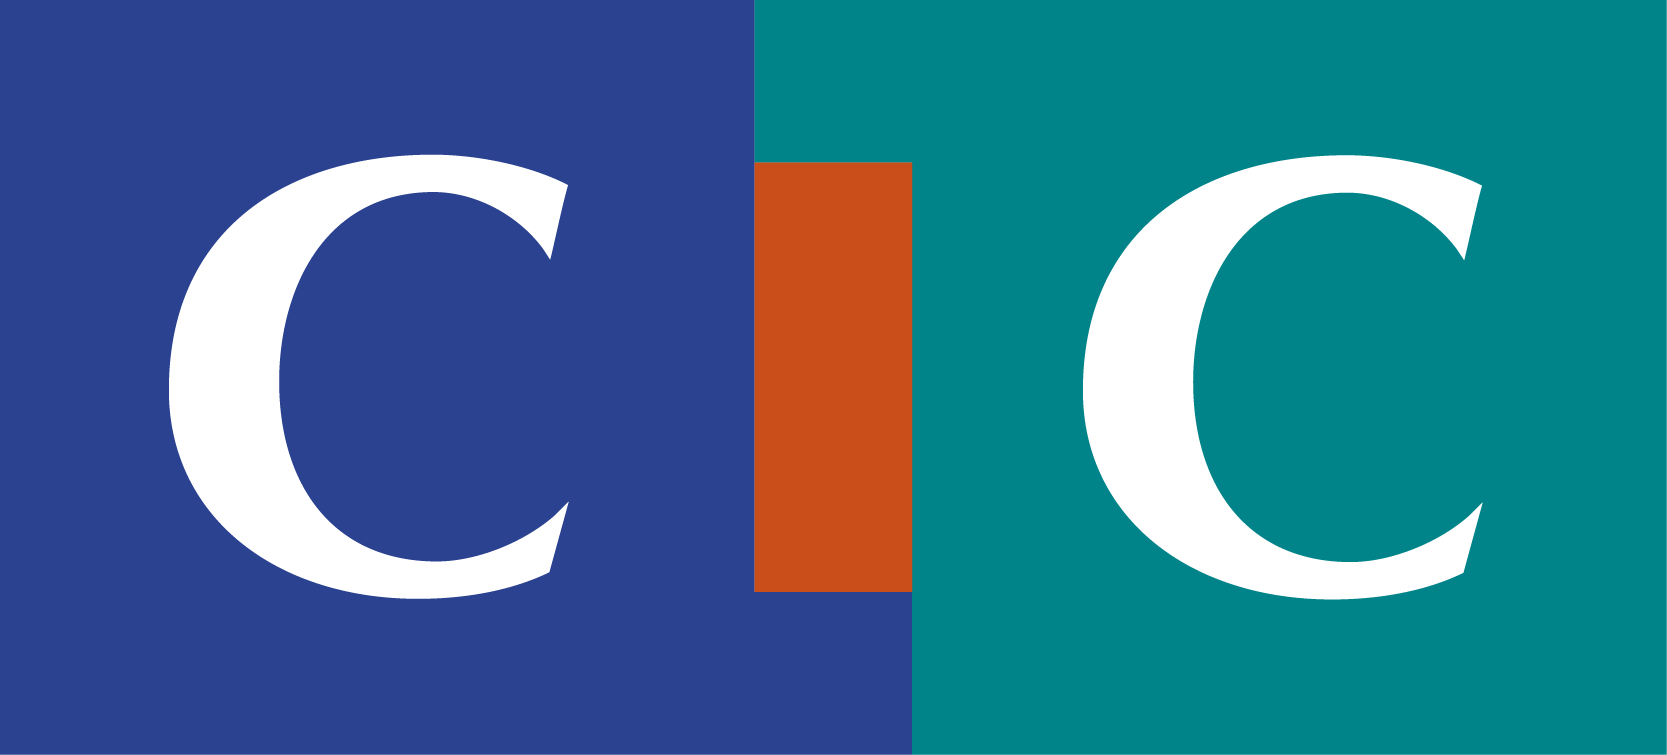 CIC Logo [Credit Industriel et Commercial] Free Vector Download.